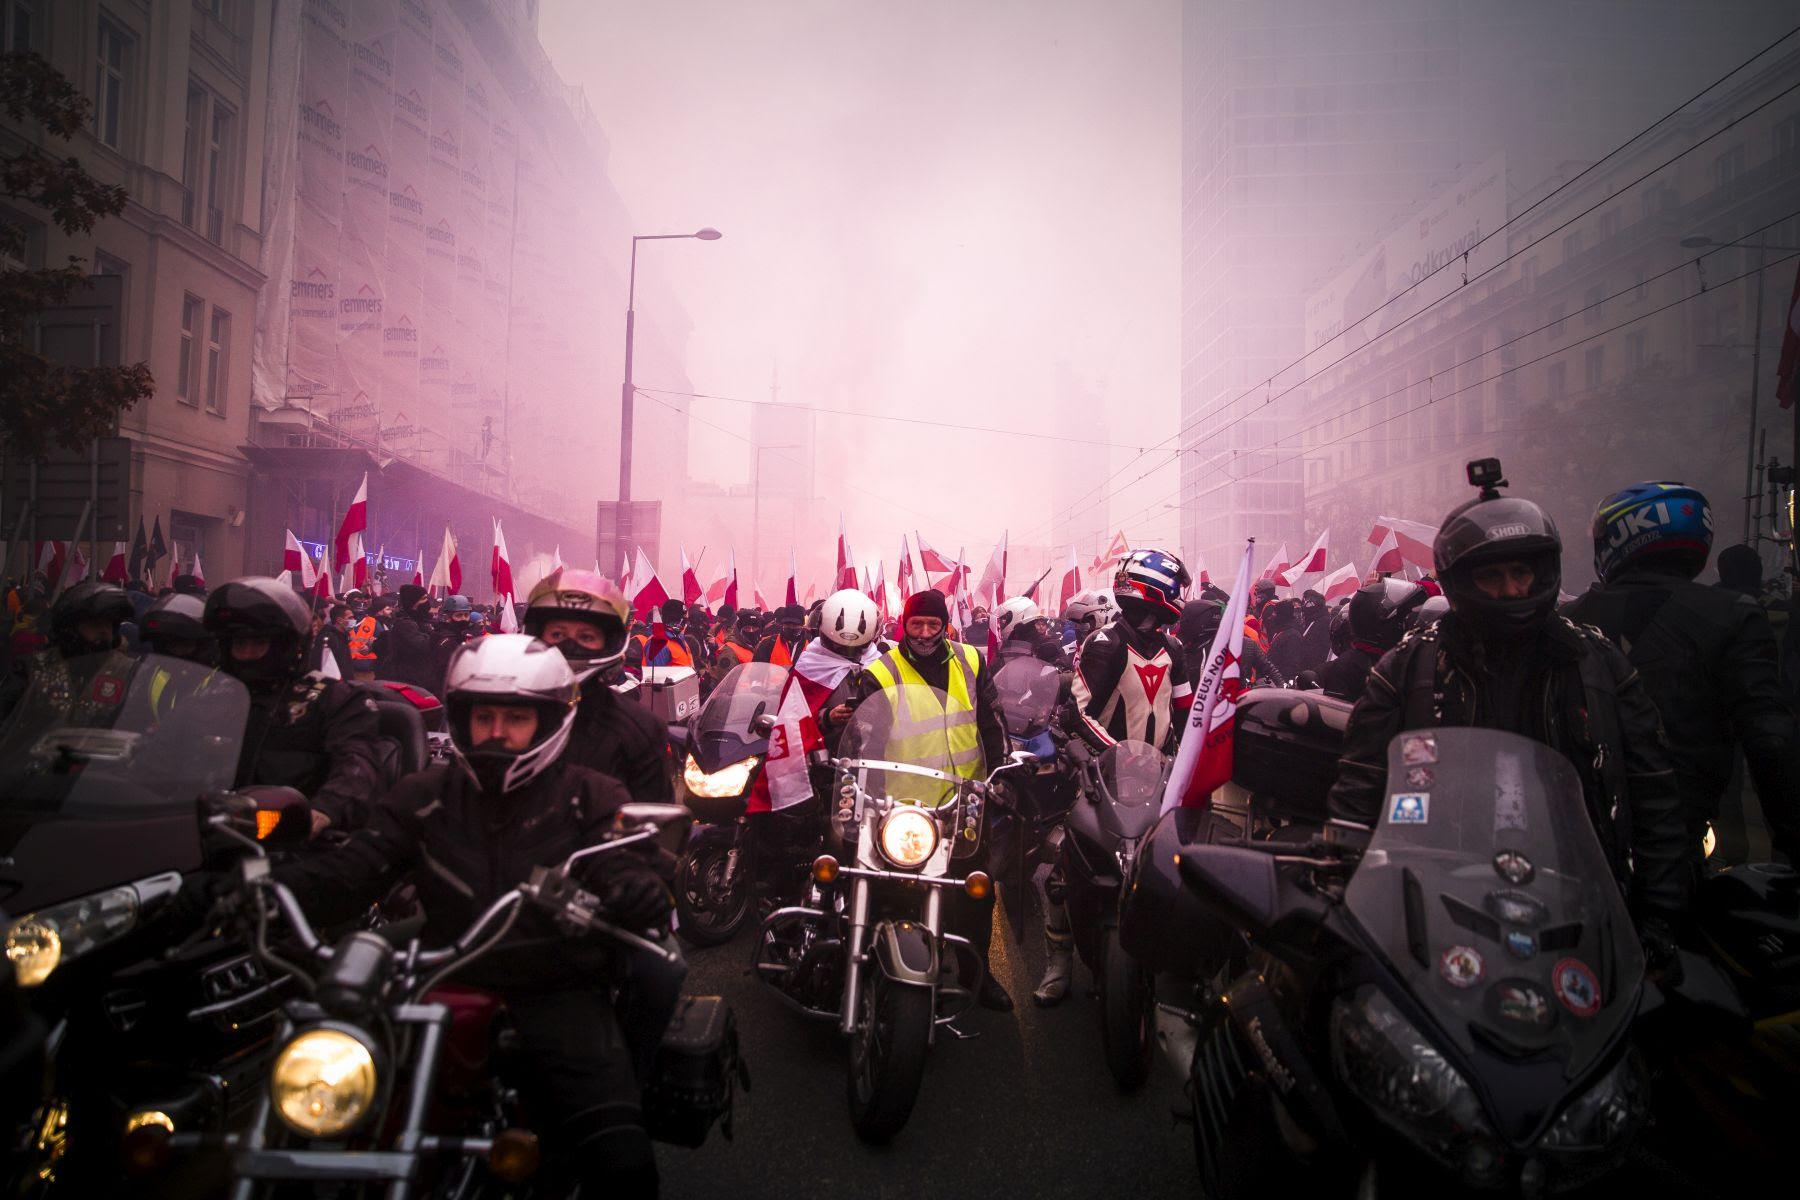 Marsz Niepodległości 2020: https://marszniepodleglosci.pl/wp-content/uploads/2020/11/20201111-Marsz-Niepodleglosci-fot.-K.-Olszewska-009.jpg